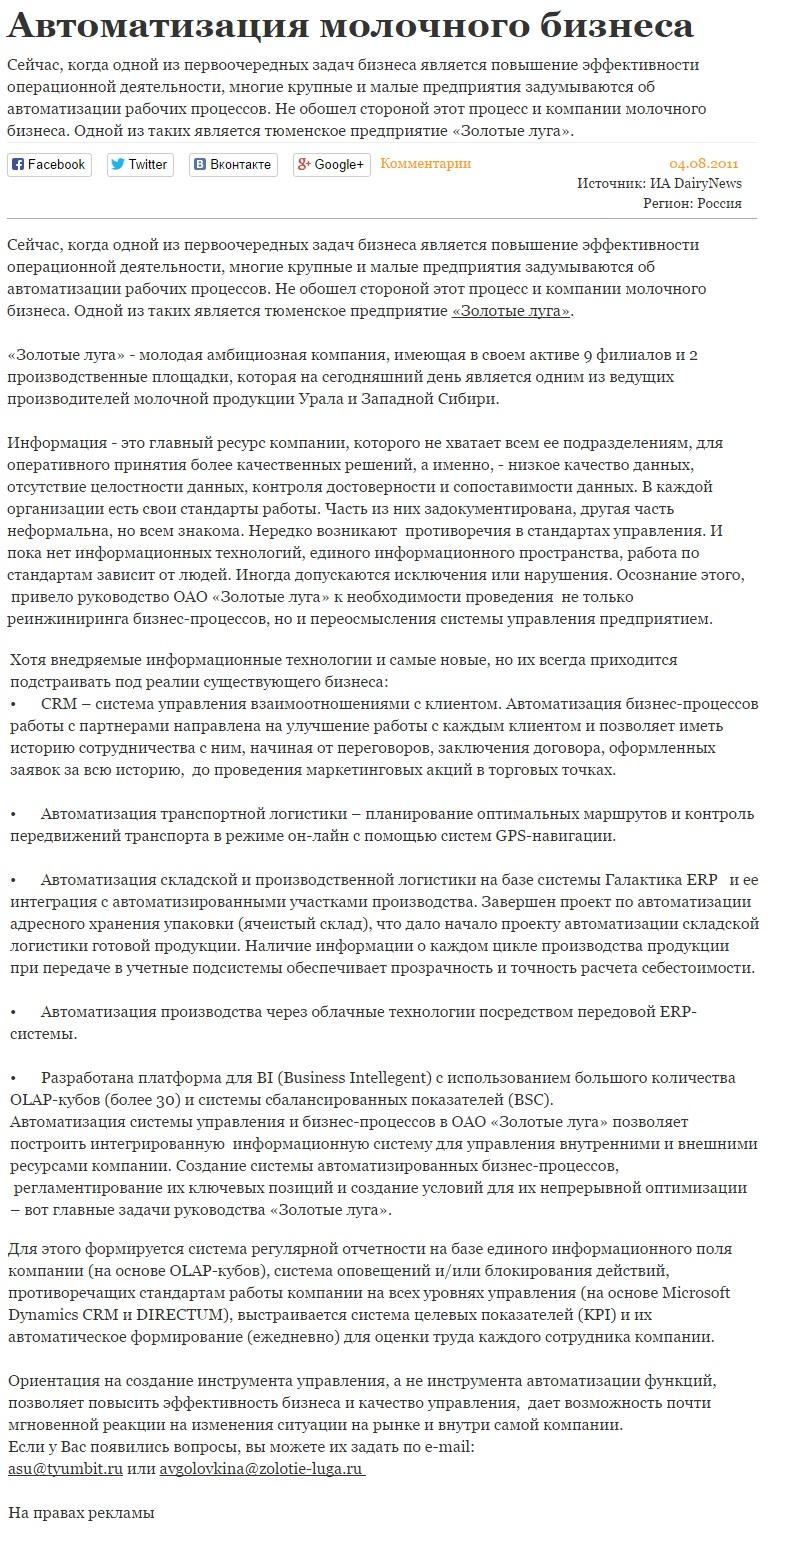 amd_news_20160516-102618